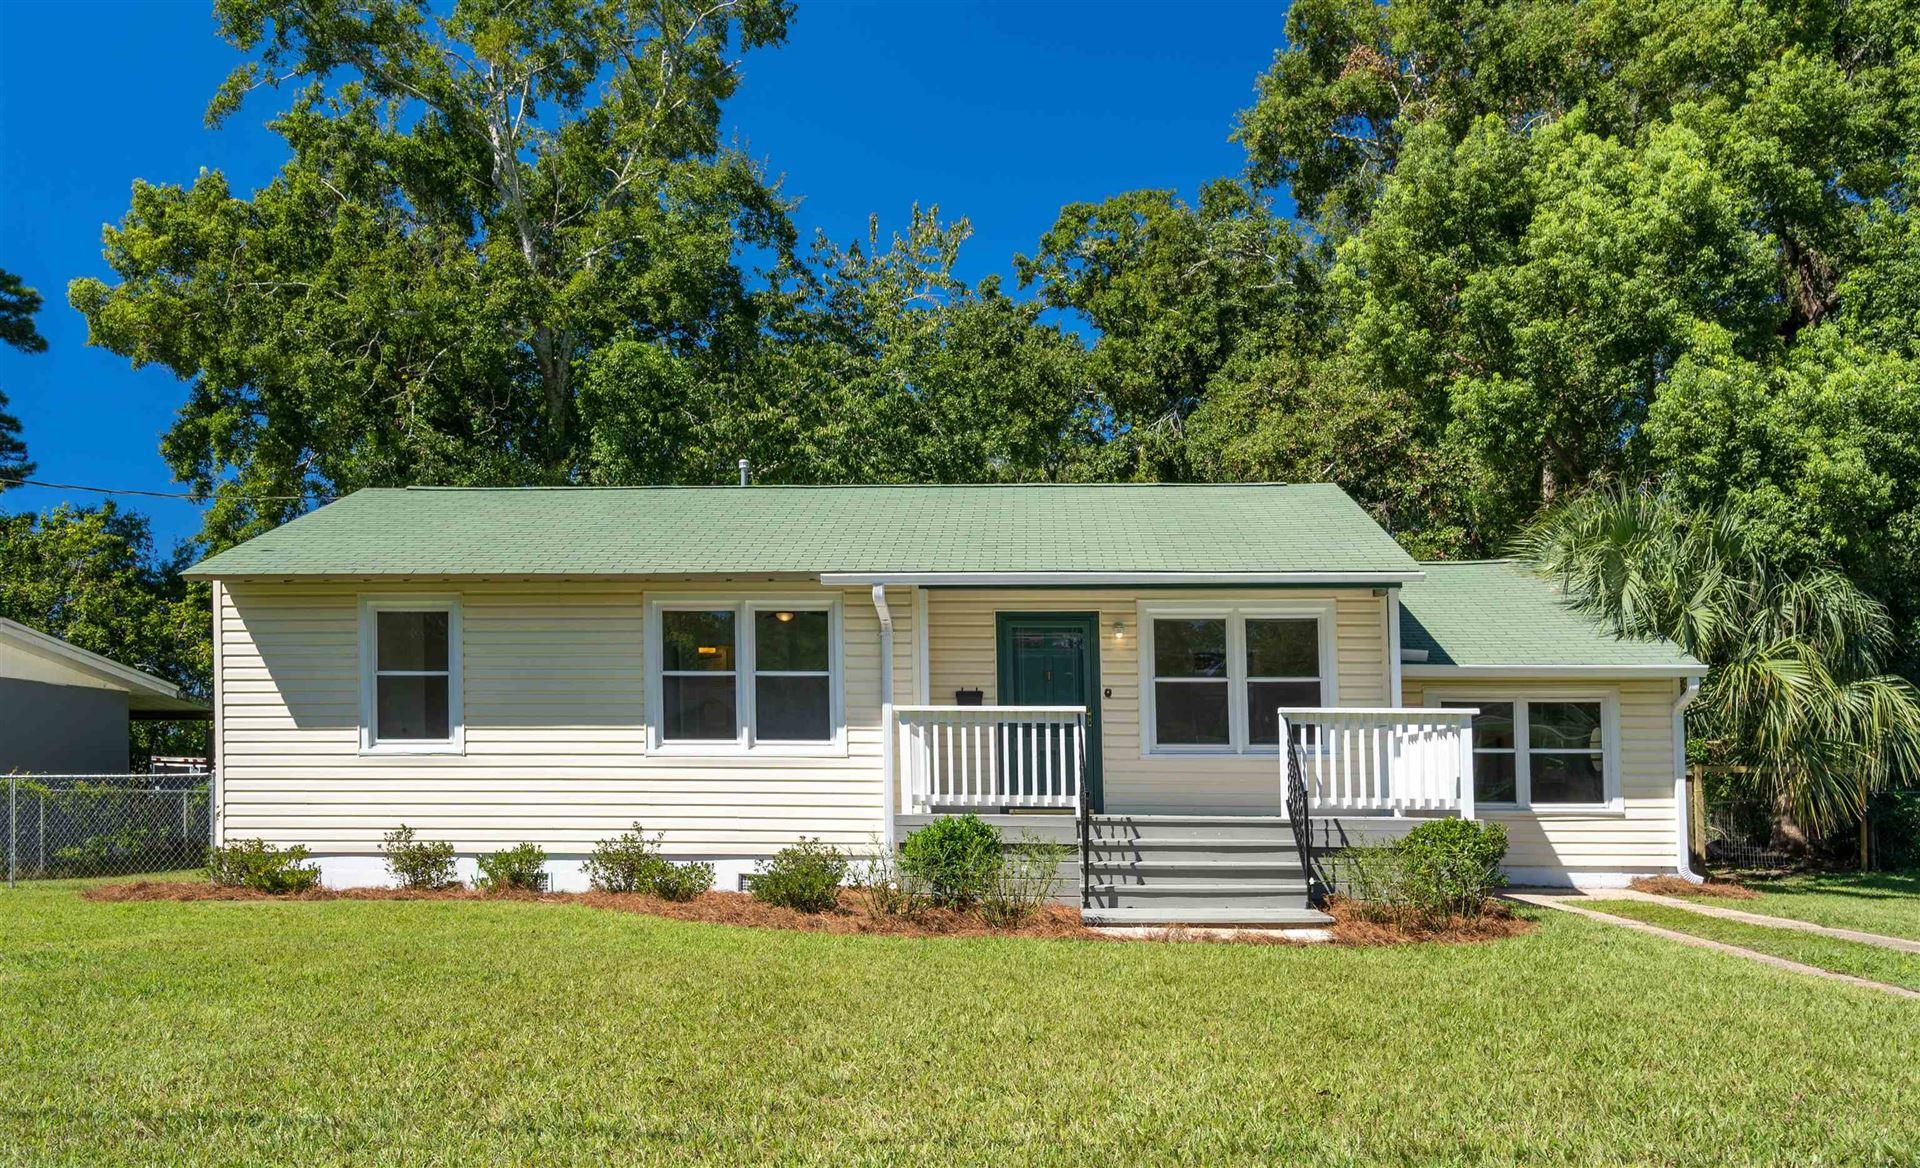 2012 E Dellview Drive, Tallahassee, FL 32303 - MLS#: 337747